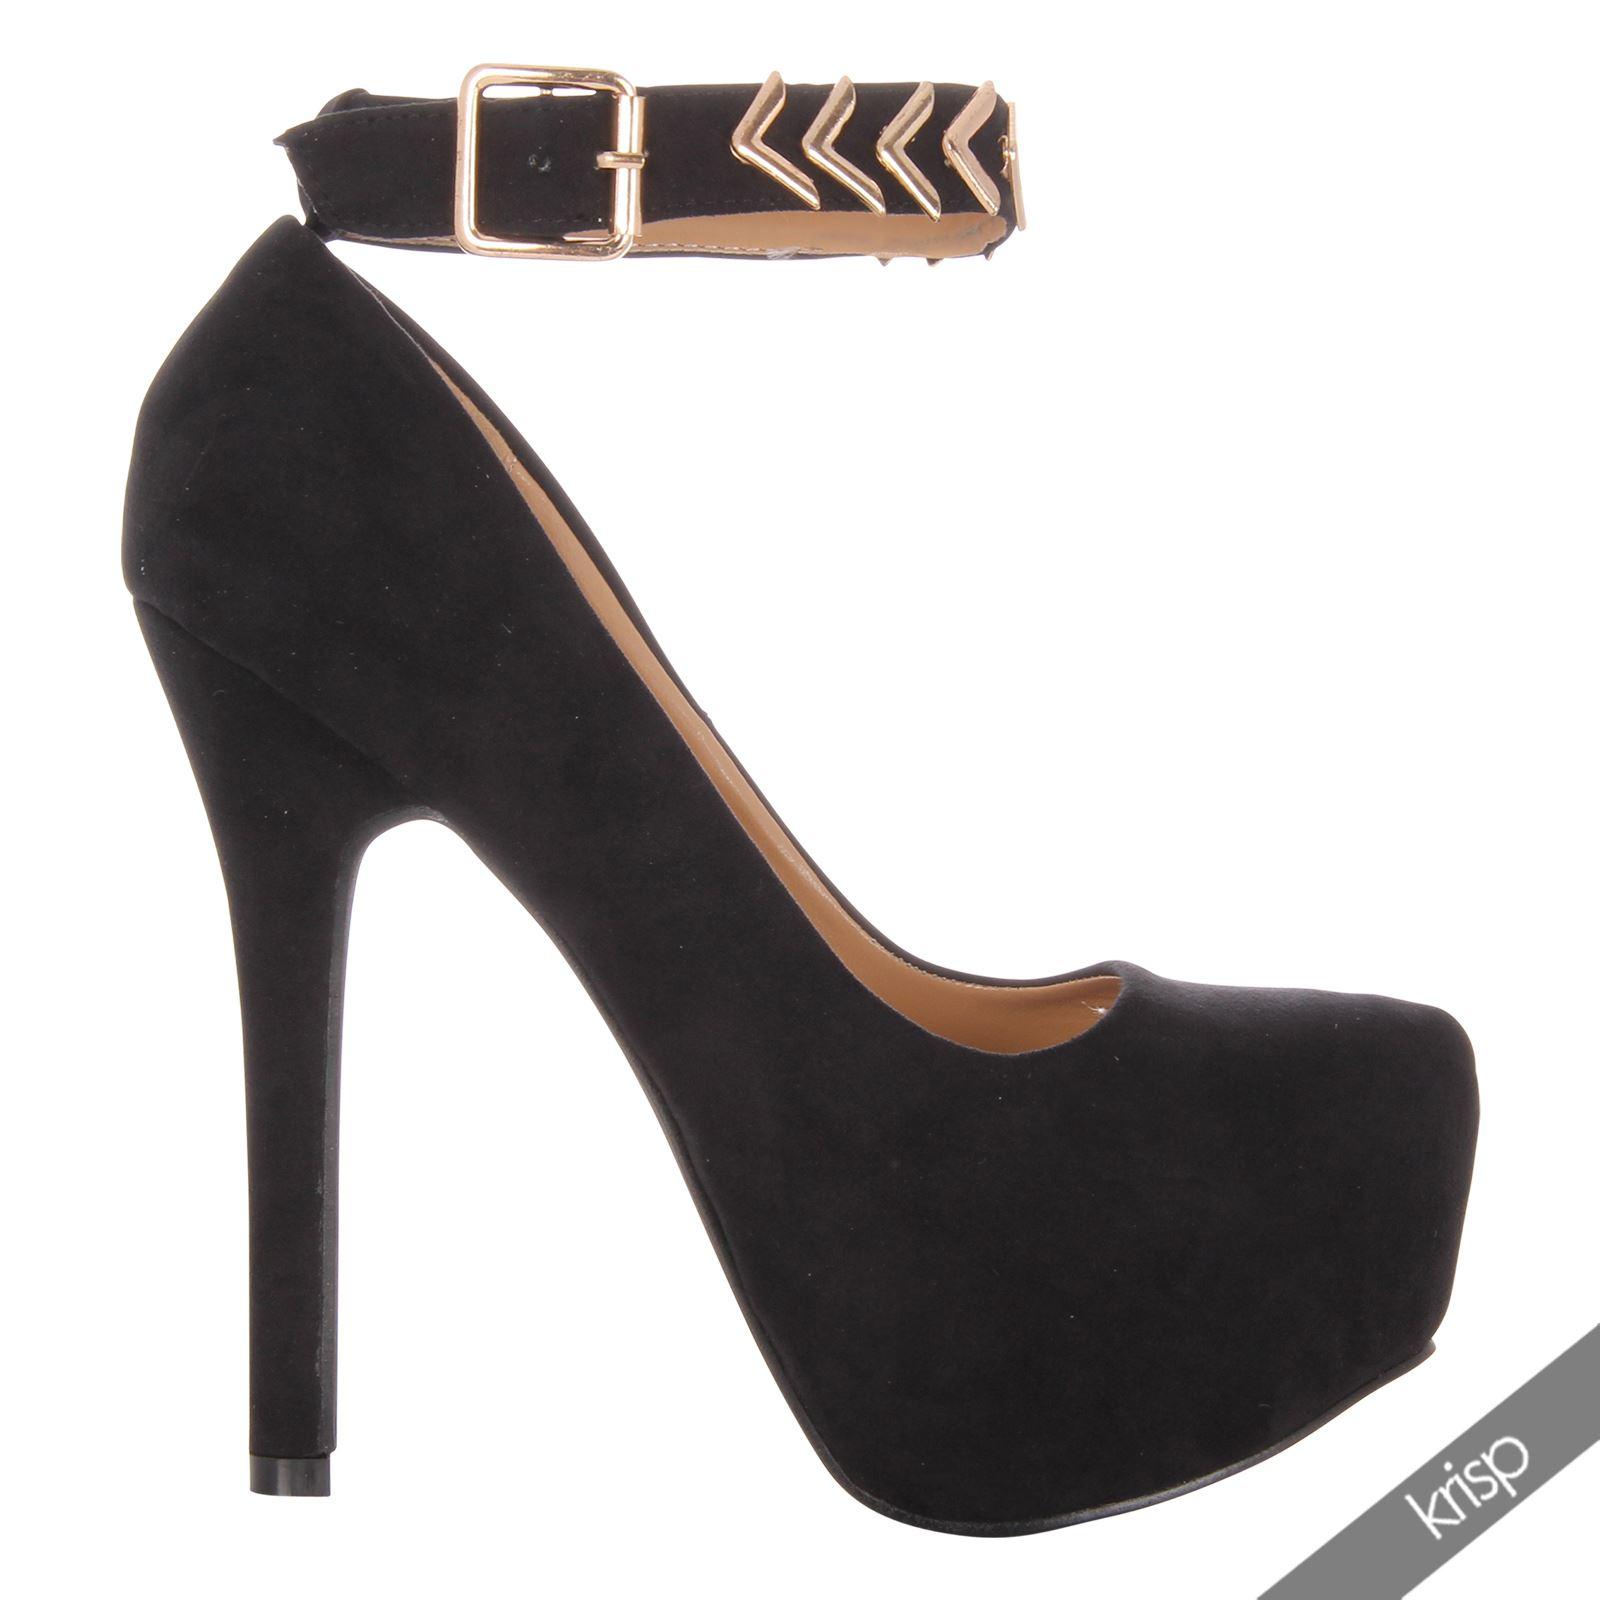 Womens Gold Metal Ankle Cuff Strap Hidden Platform Wedge High Heel Shoes Party | eBay